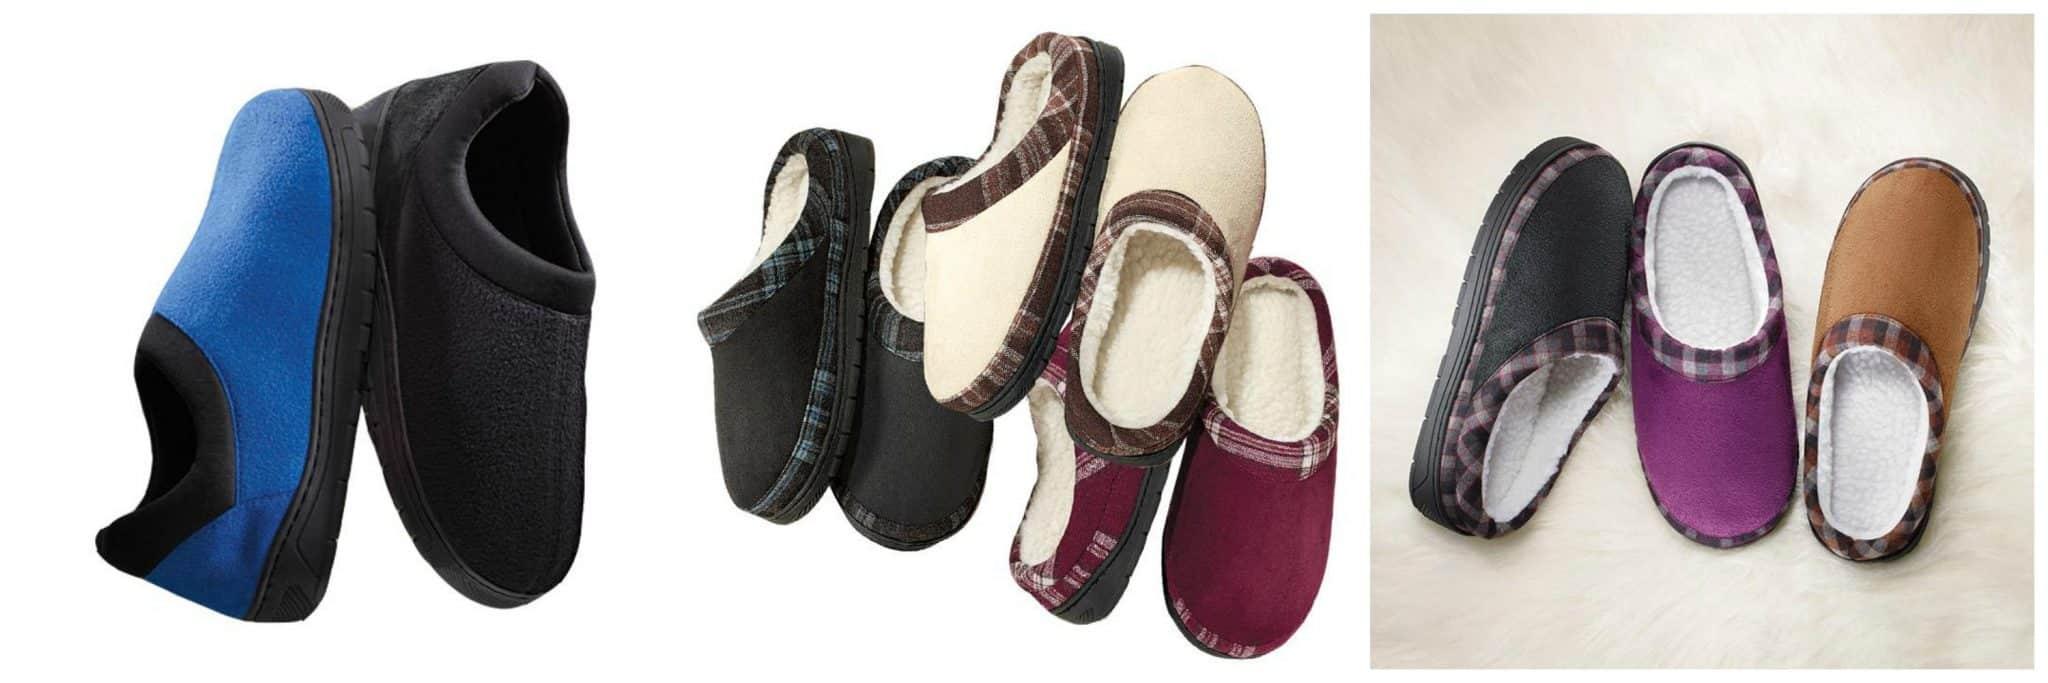 c452df8c3b5 Buy Avon Memory Foam Unisex Slippers - Men   Women Christmas Gifts